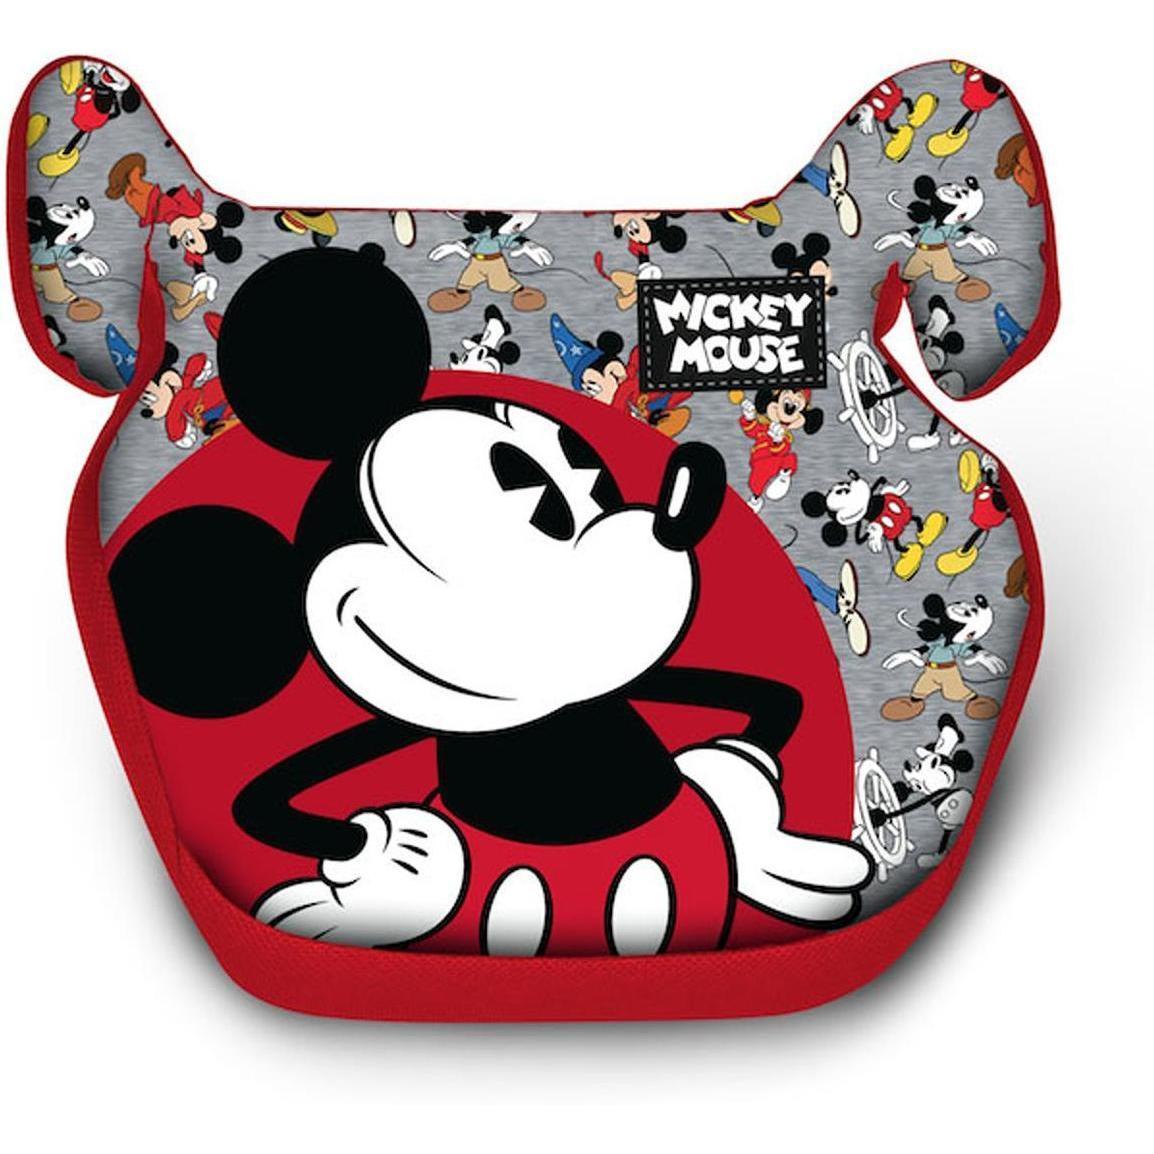 Inaltator Auto Mickey Mouse Disney Disney Eurasia 25348 imagine